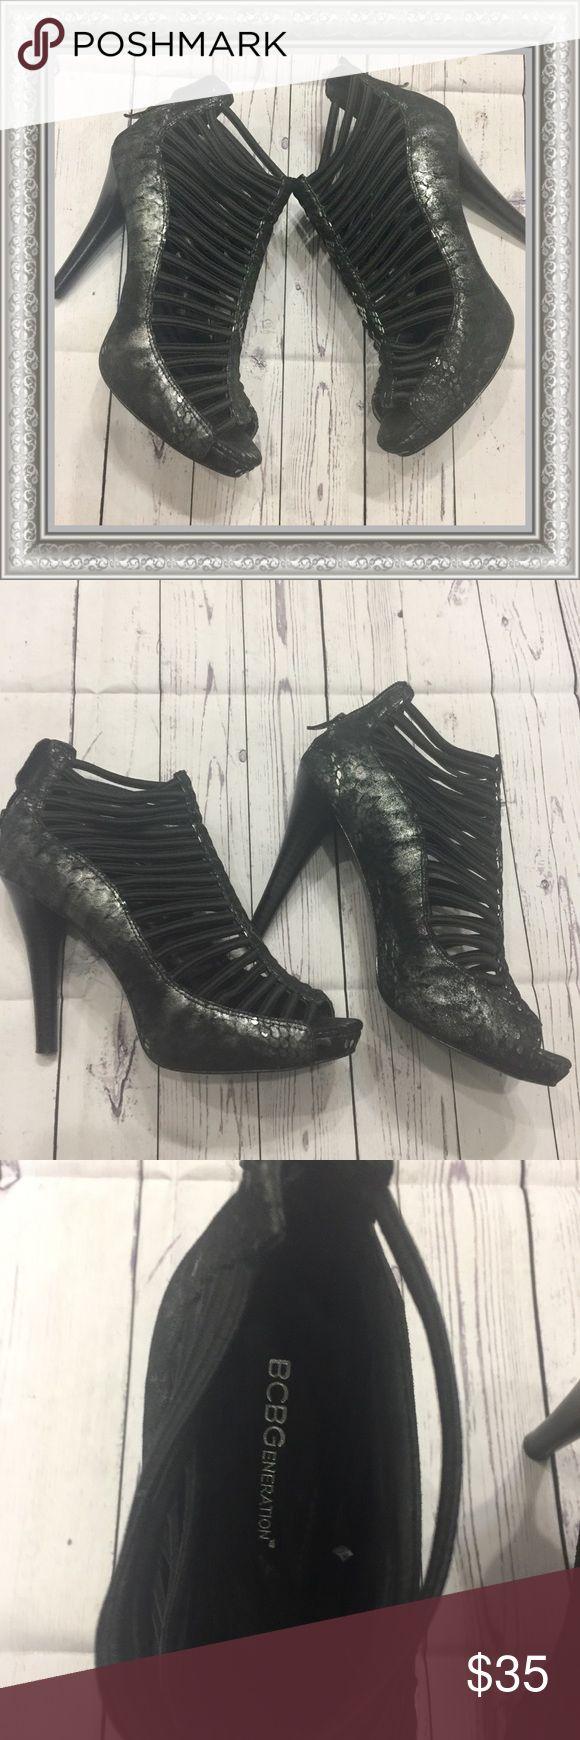 EUC!!! BCBGeneration Metallic Snakeskin Heel Worn only once!! Sole's have minimal scuffing! BCBGeneration Caged Elastic Metallic Snakeskin Heel. Peep Toe. Back Zipper. Hidden Platform. BCBGeneration Shoes Heels